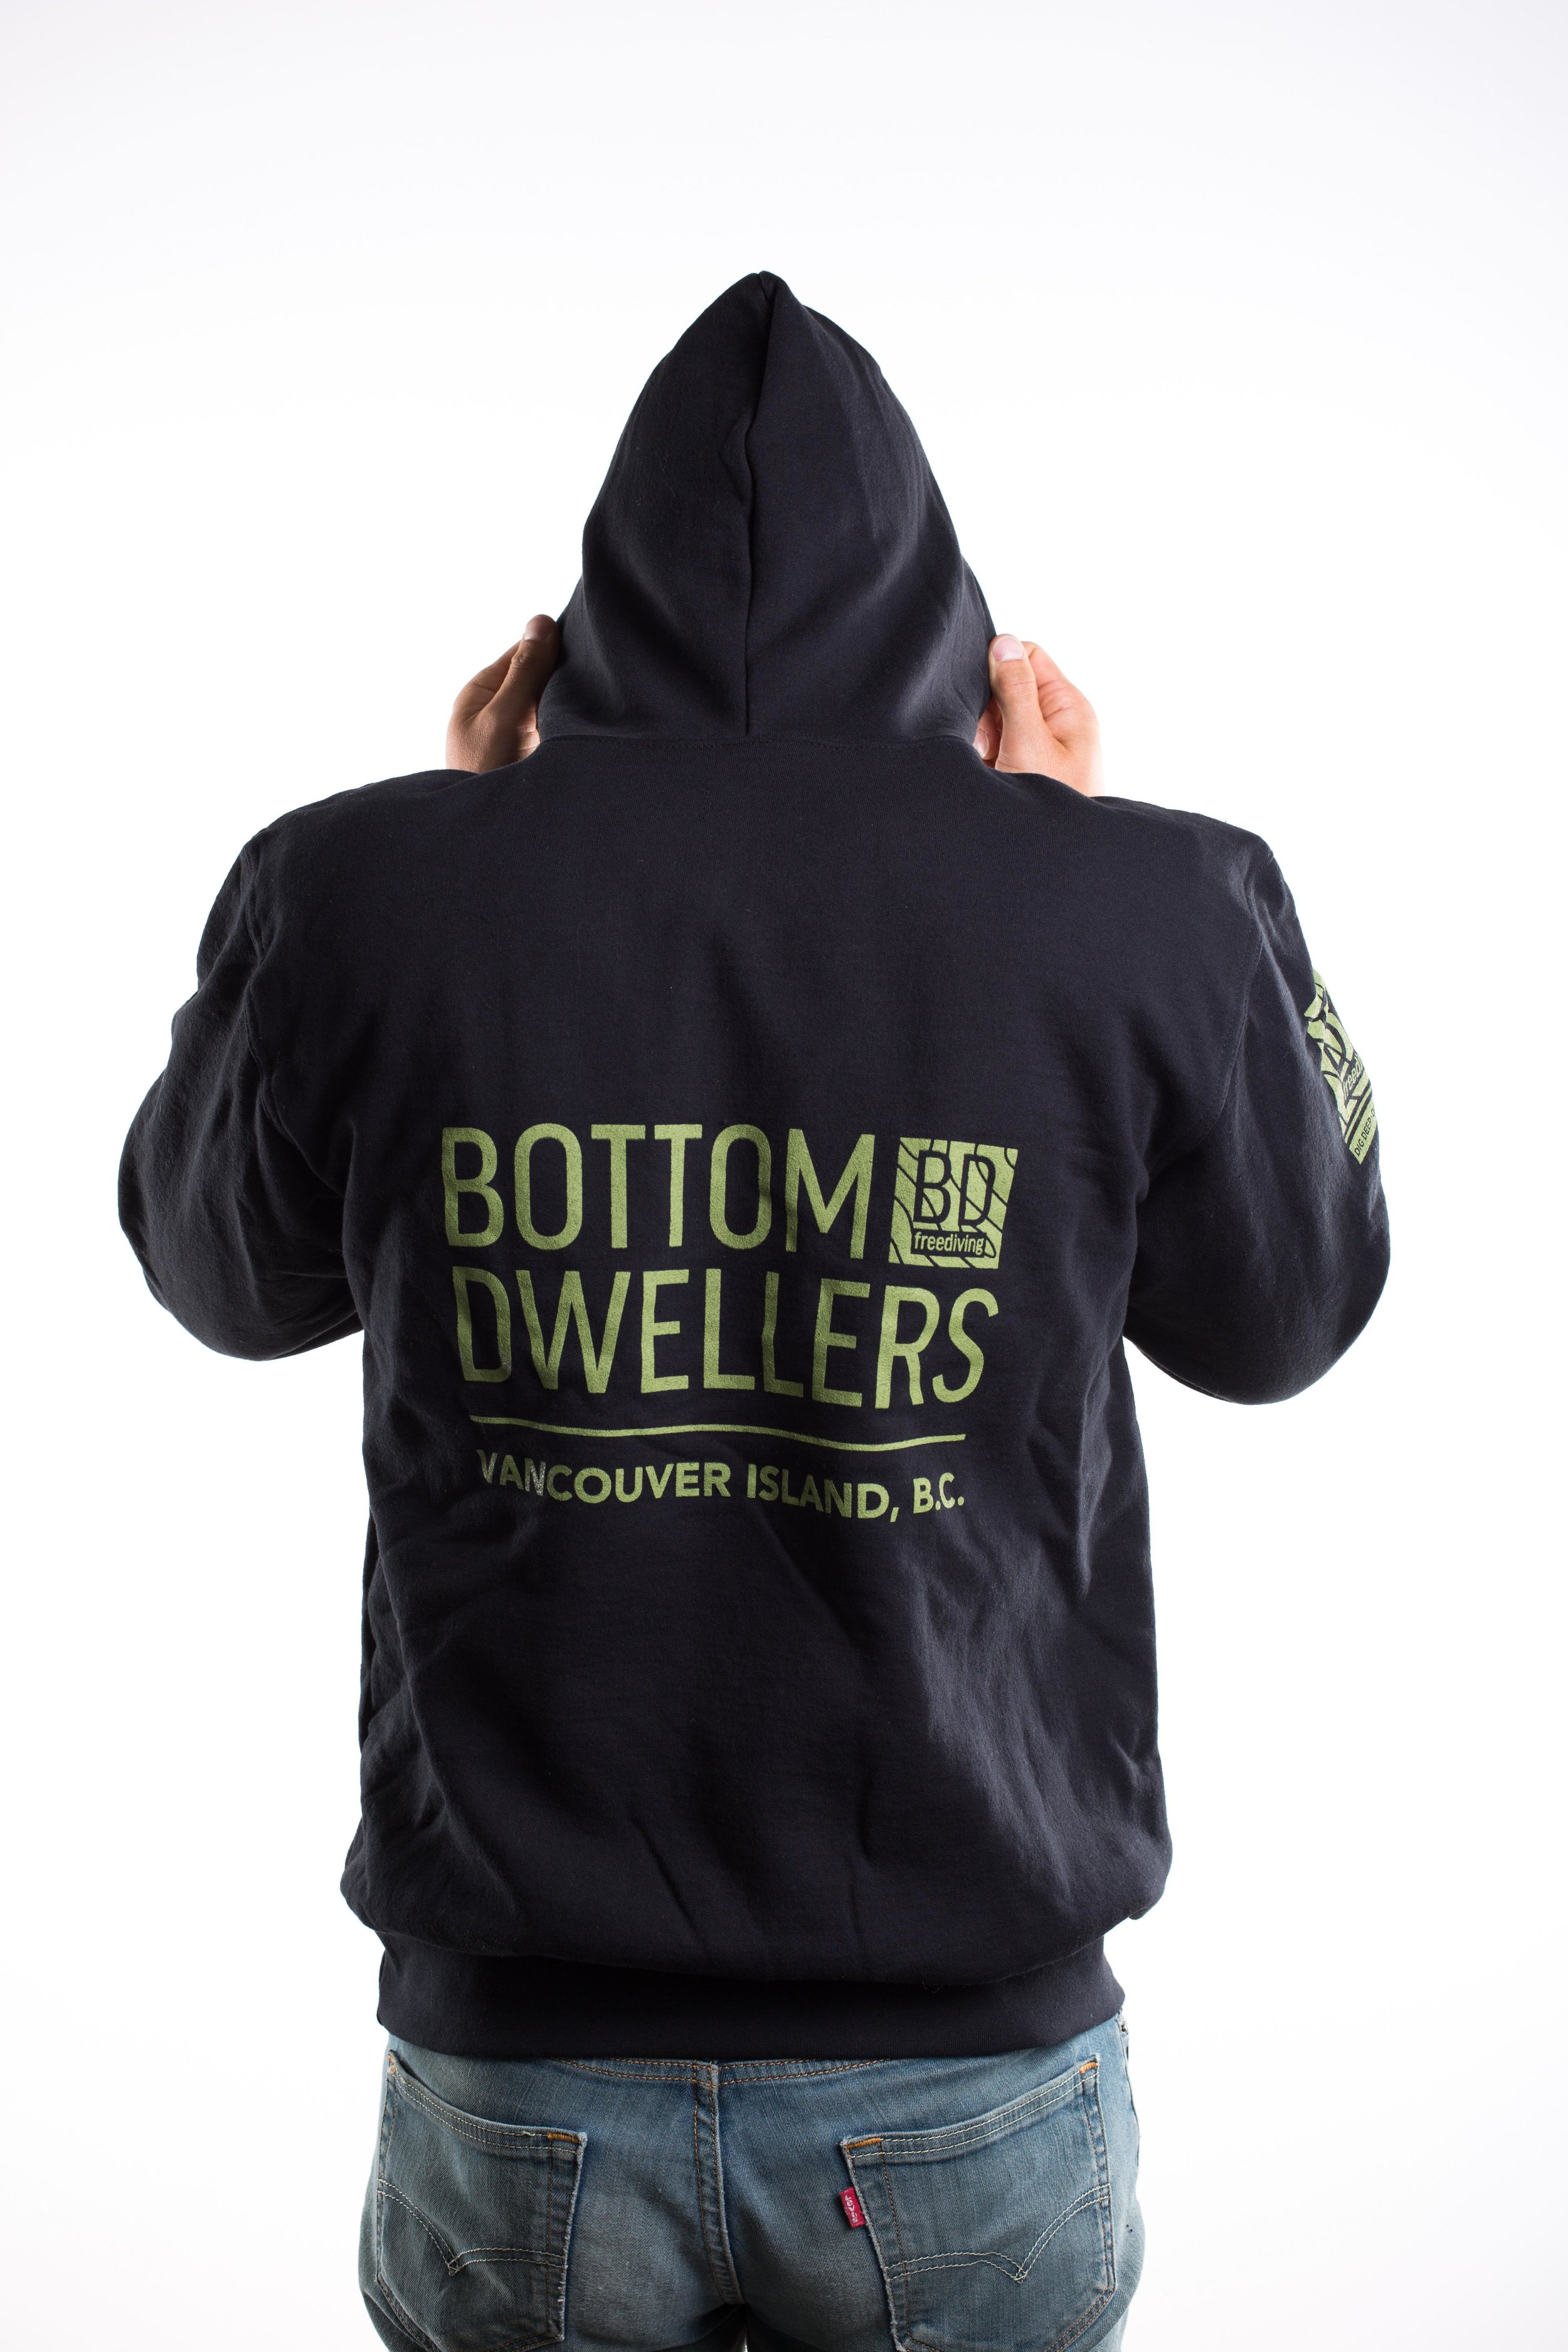 BOTTOM_DWELLERS_WEB_RESOLUTION-51.jpeg